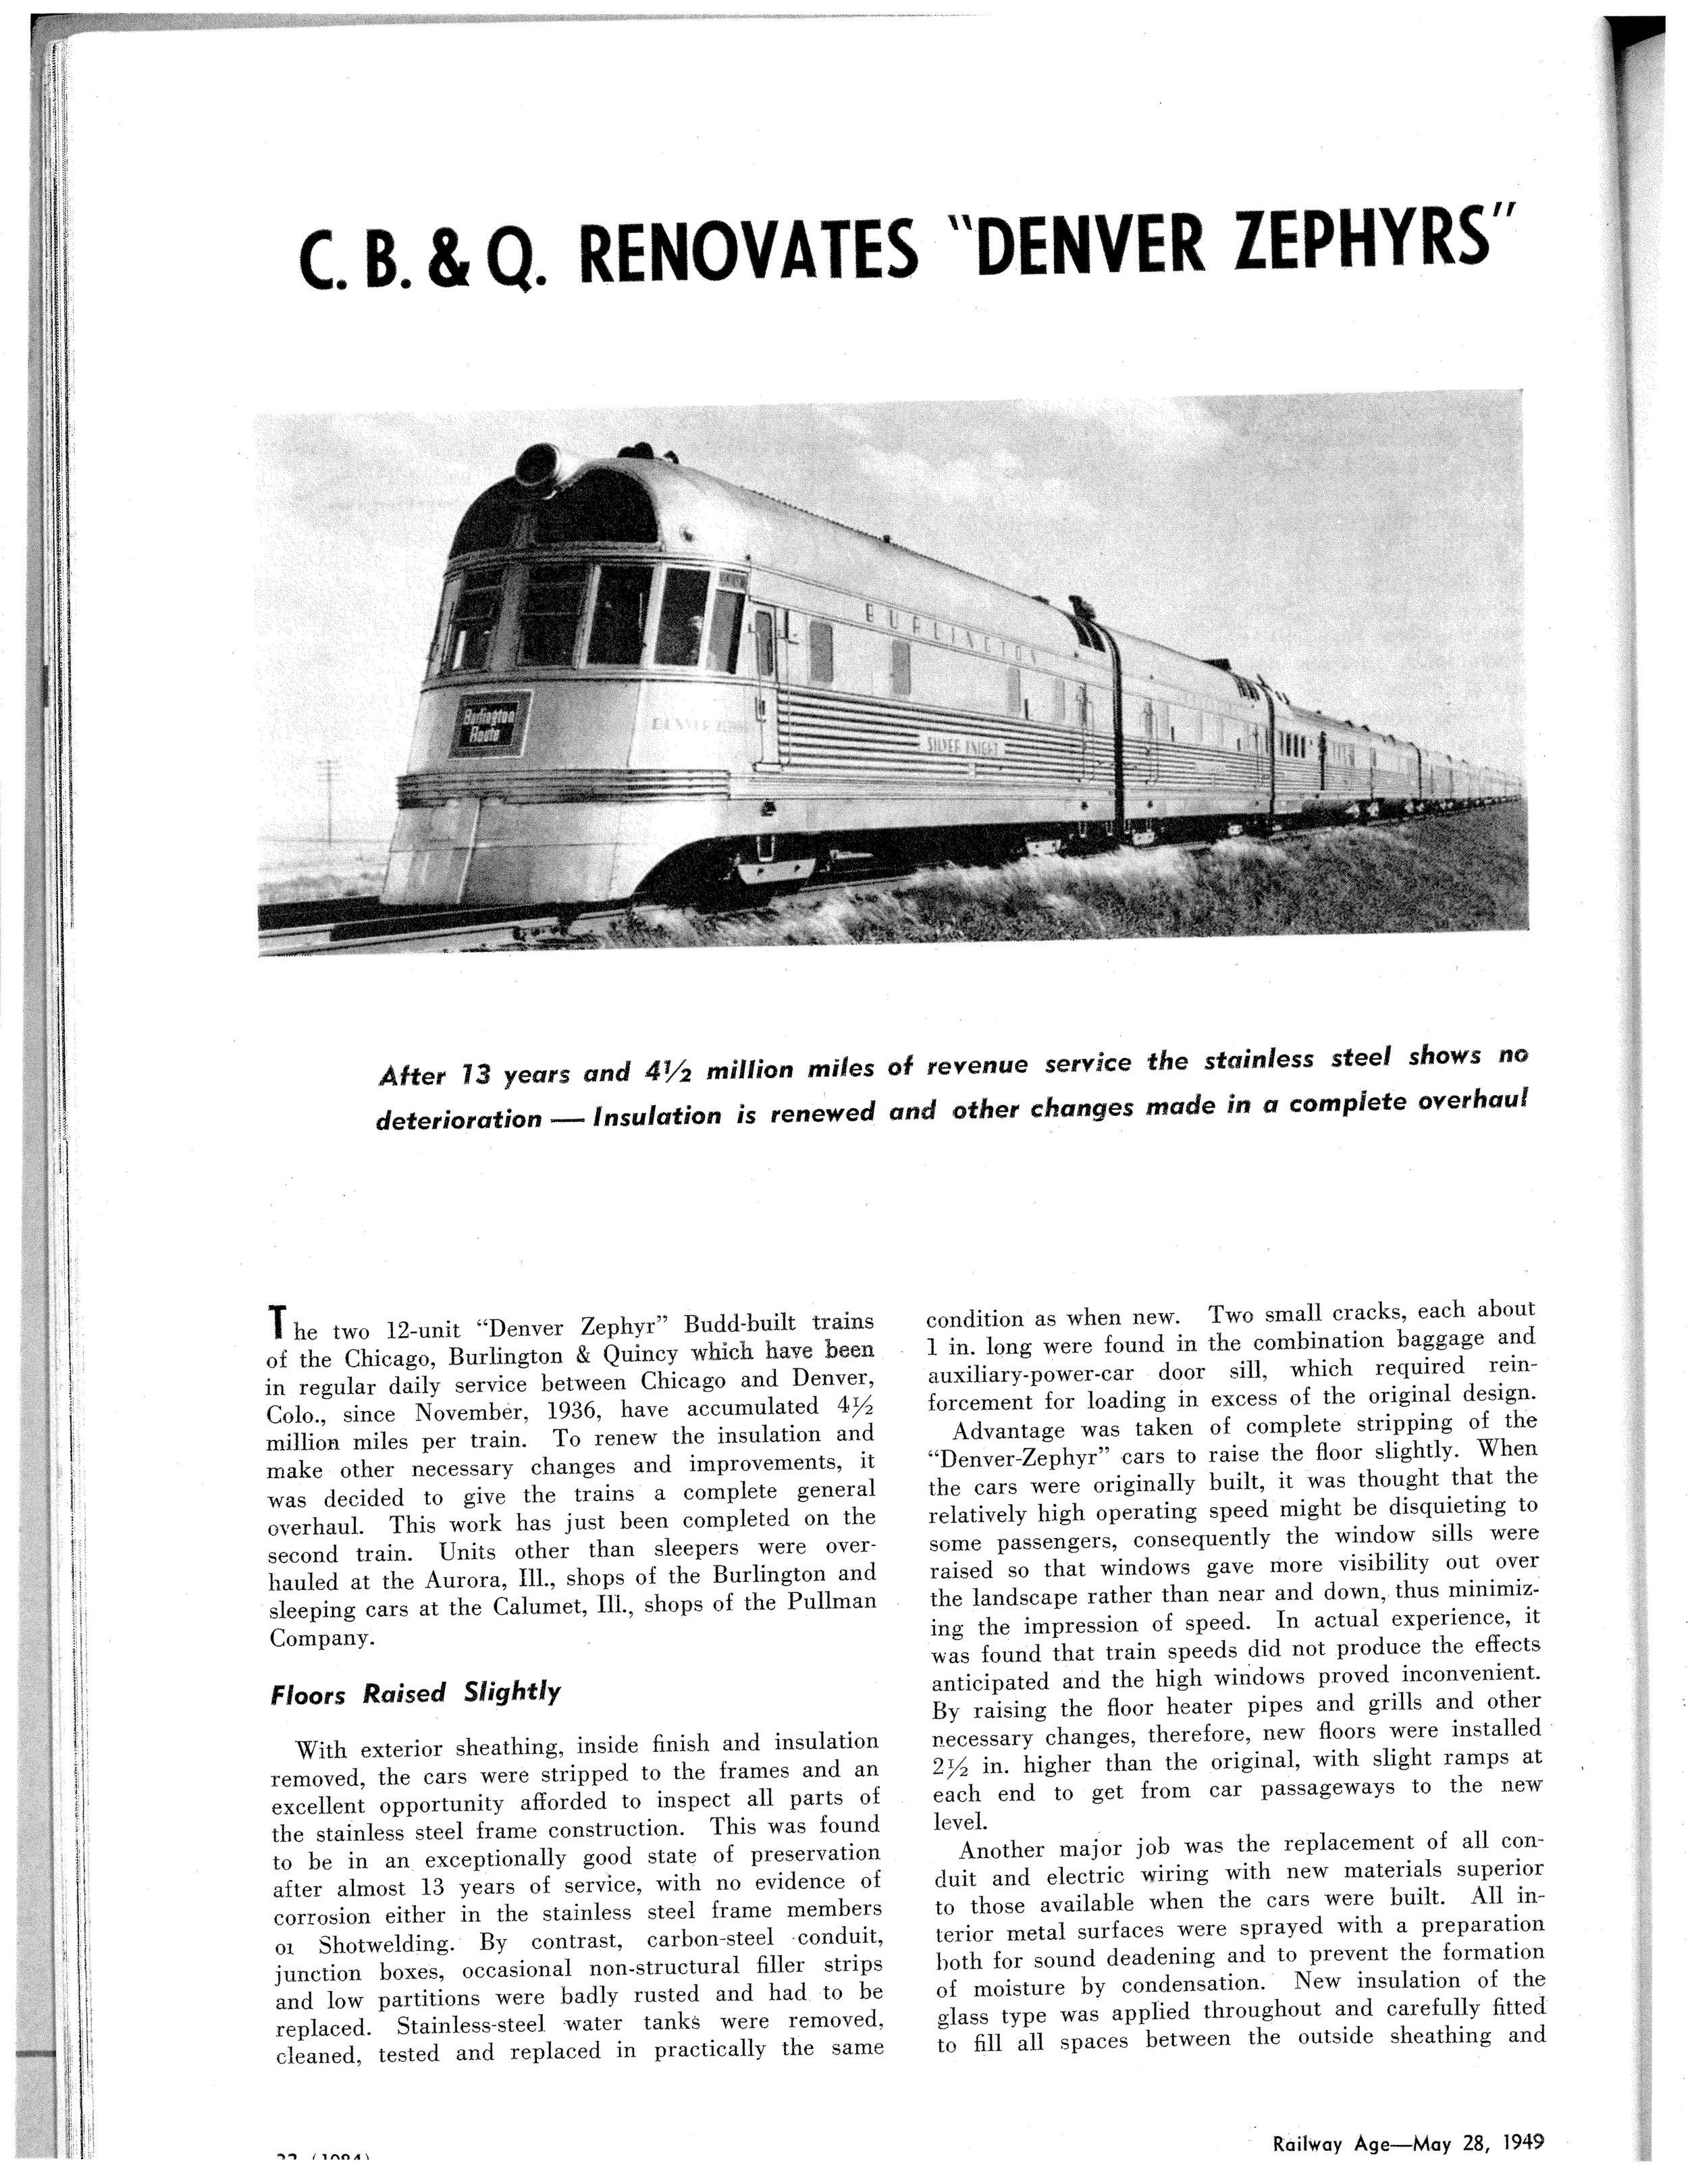 1949+Railway+Age+Article+on+car+updates 1.jpg